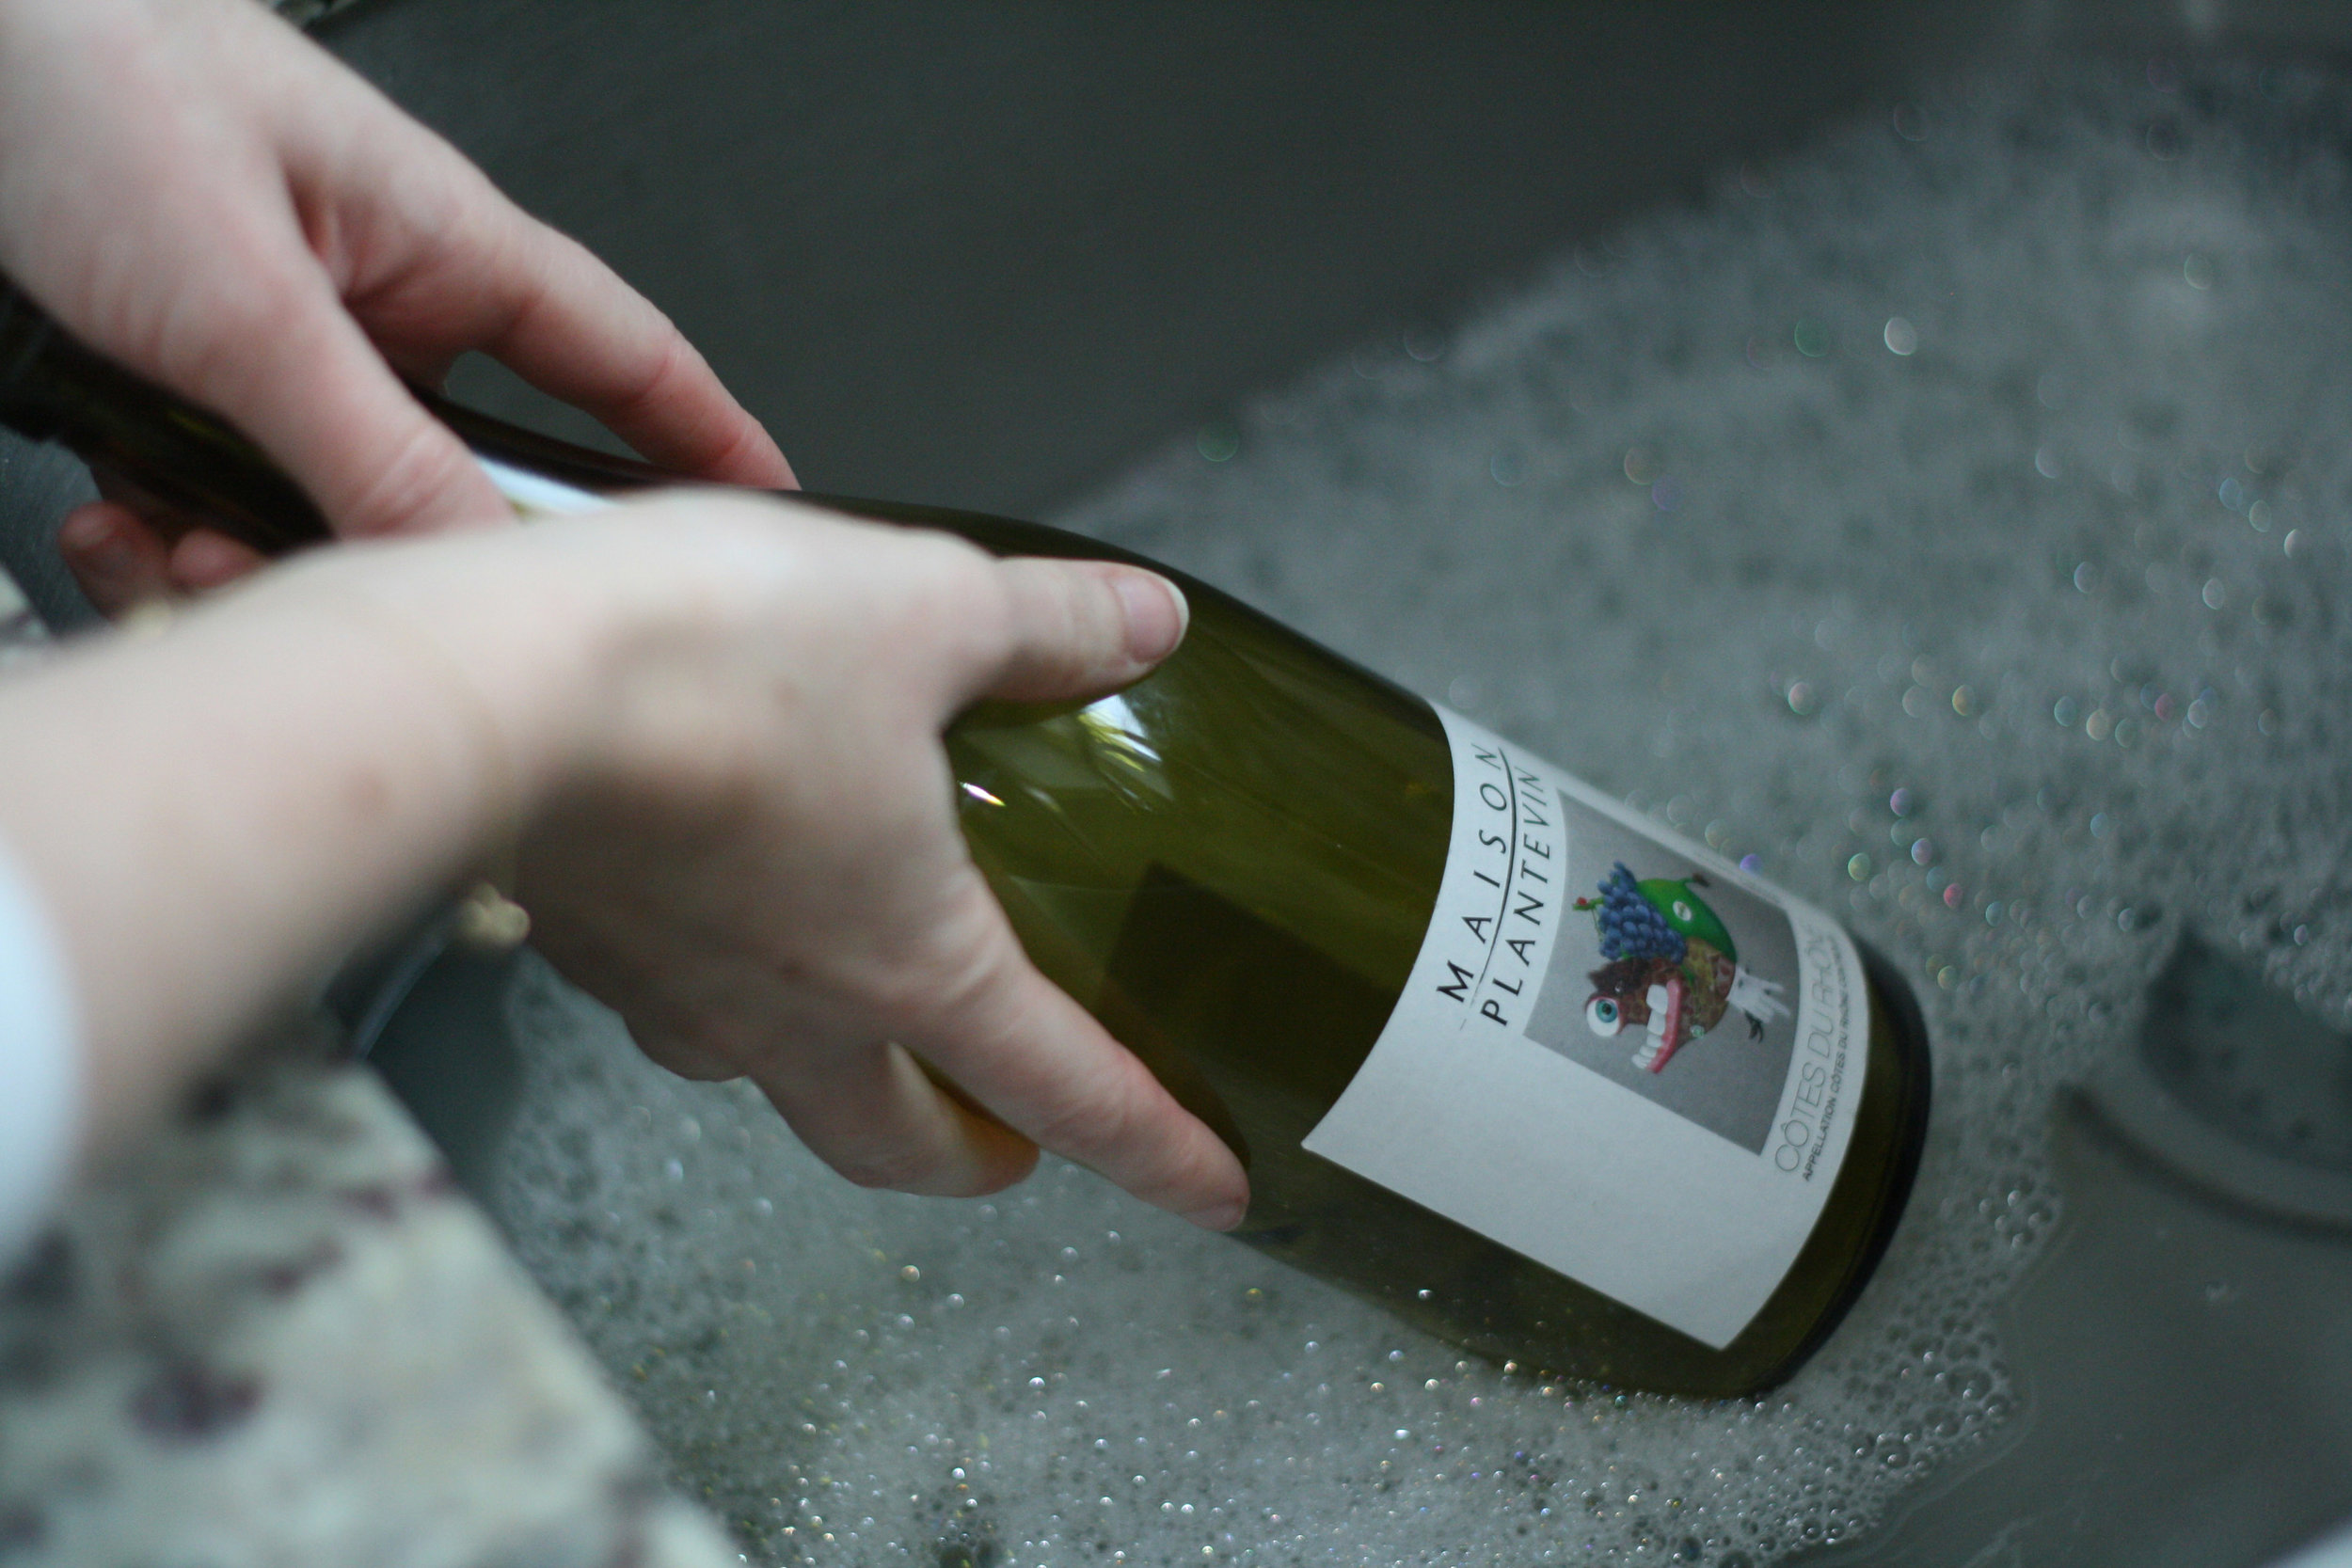 remove wine bottle label